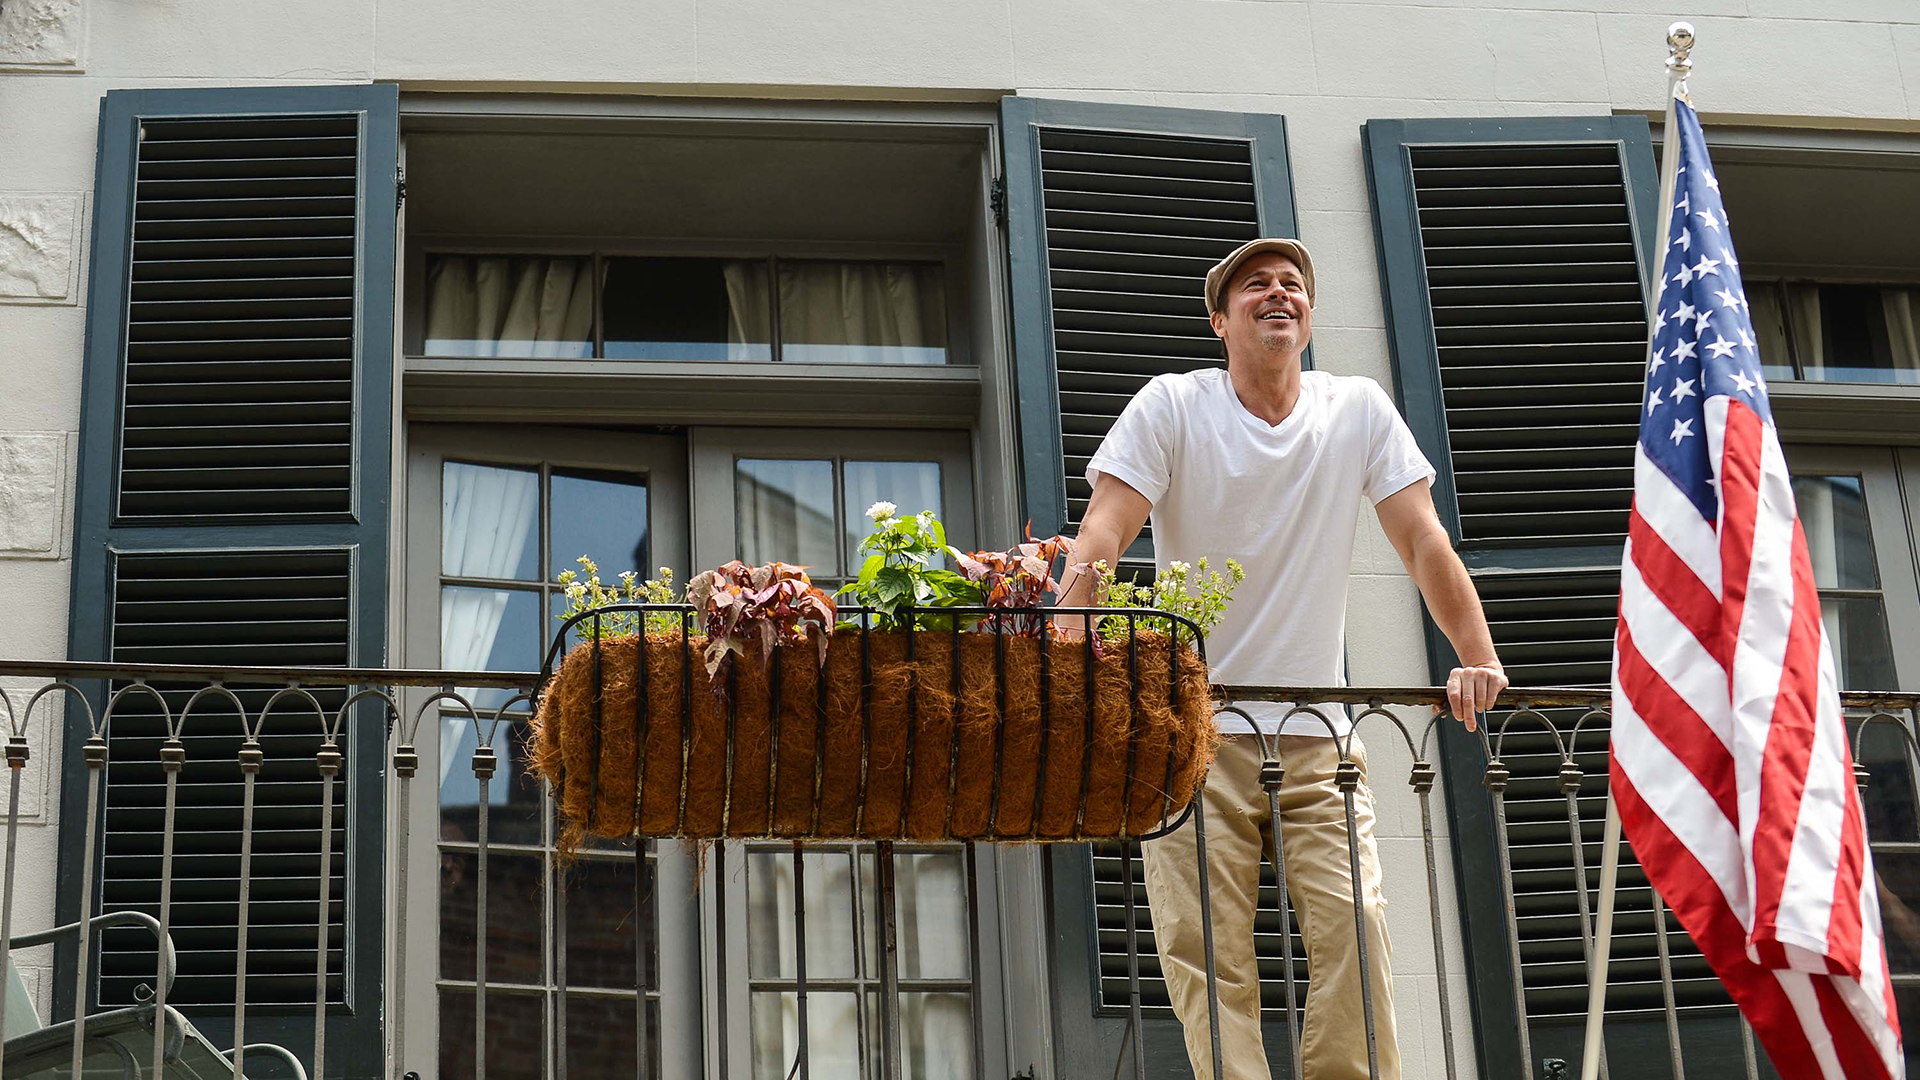 Brad Pitt New Orleans Home Listing